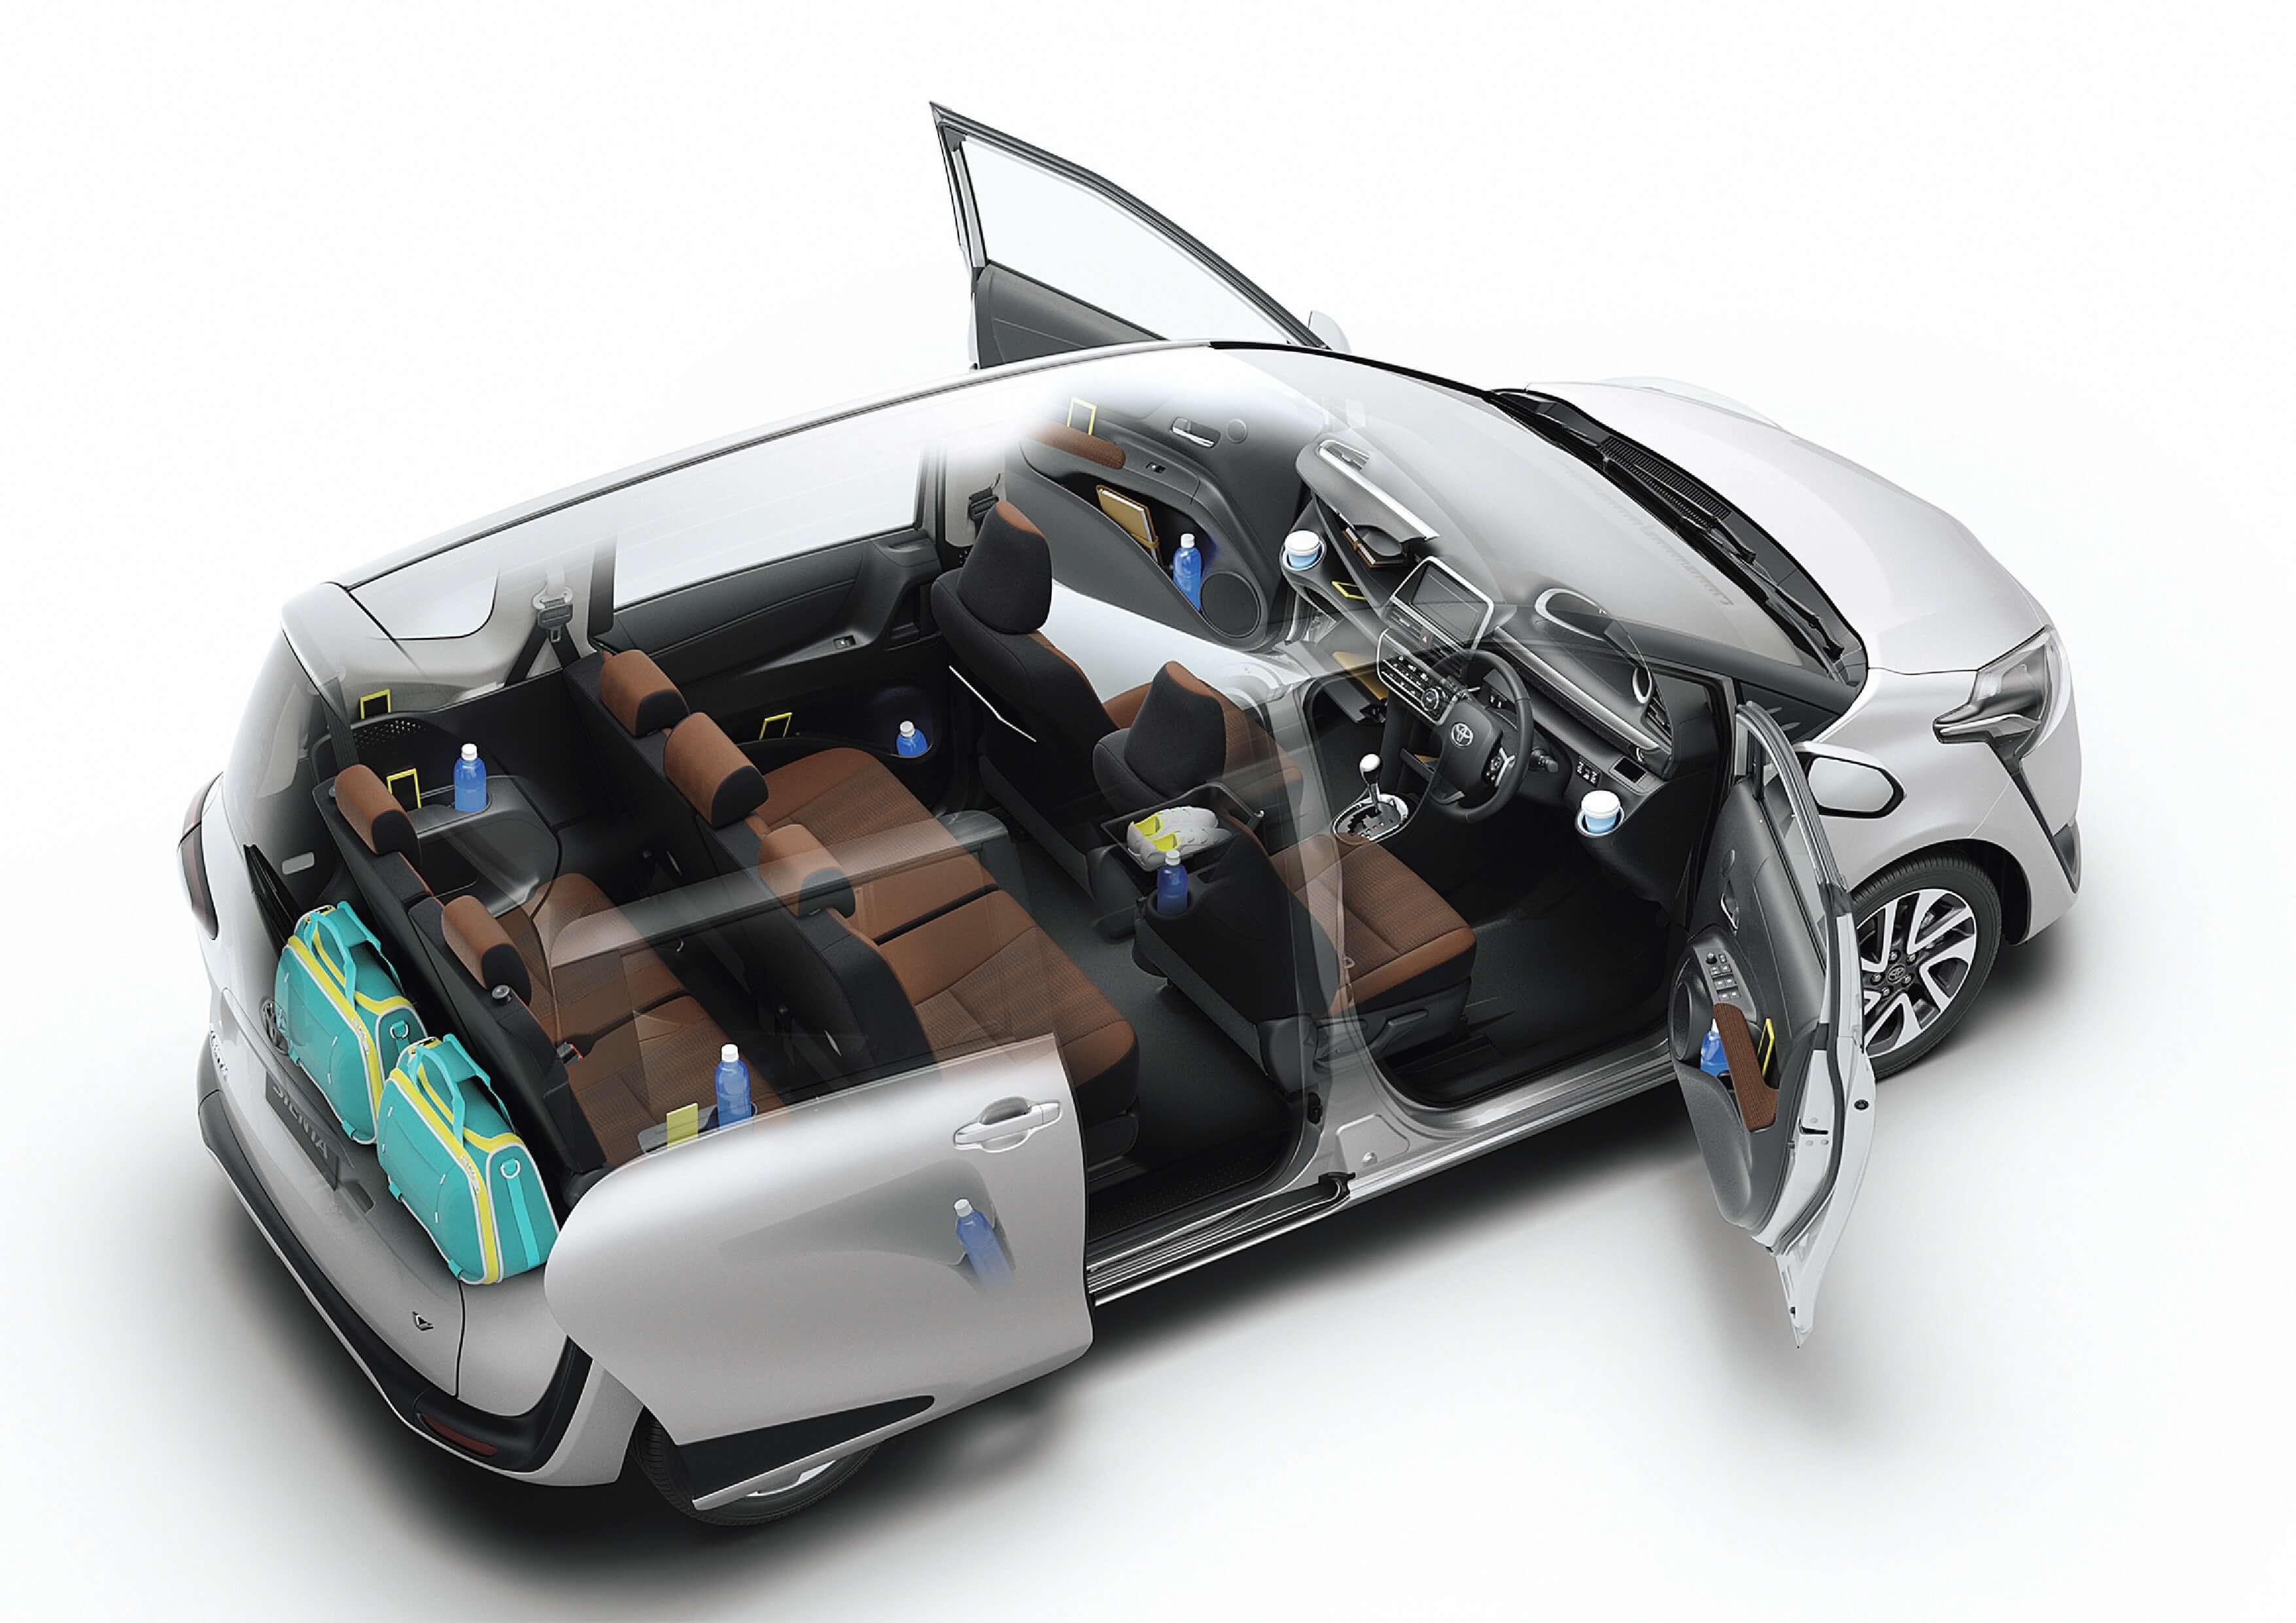 Toyota Sienta 7 Seater Mpv Family Car